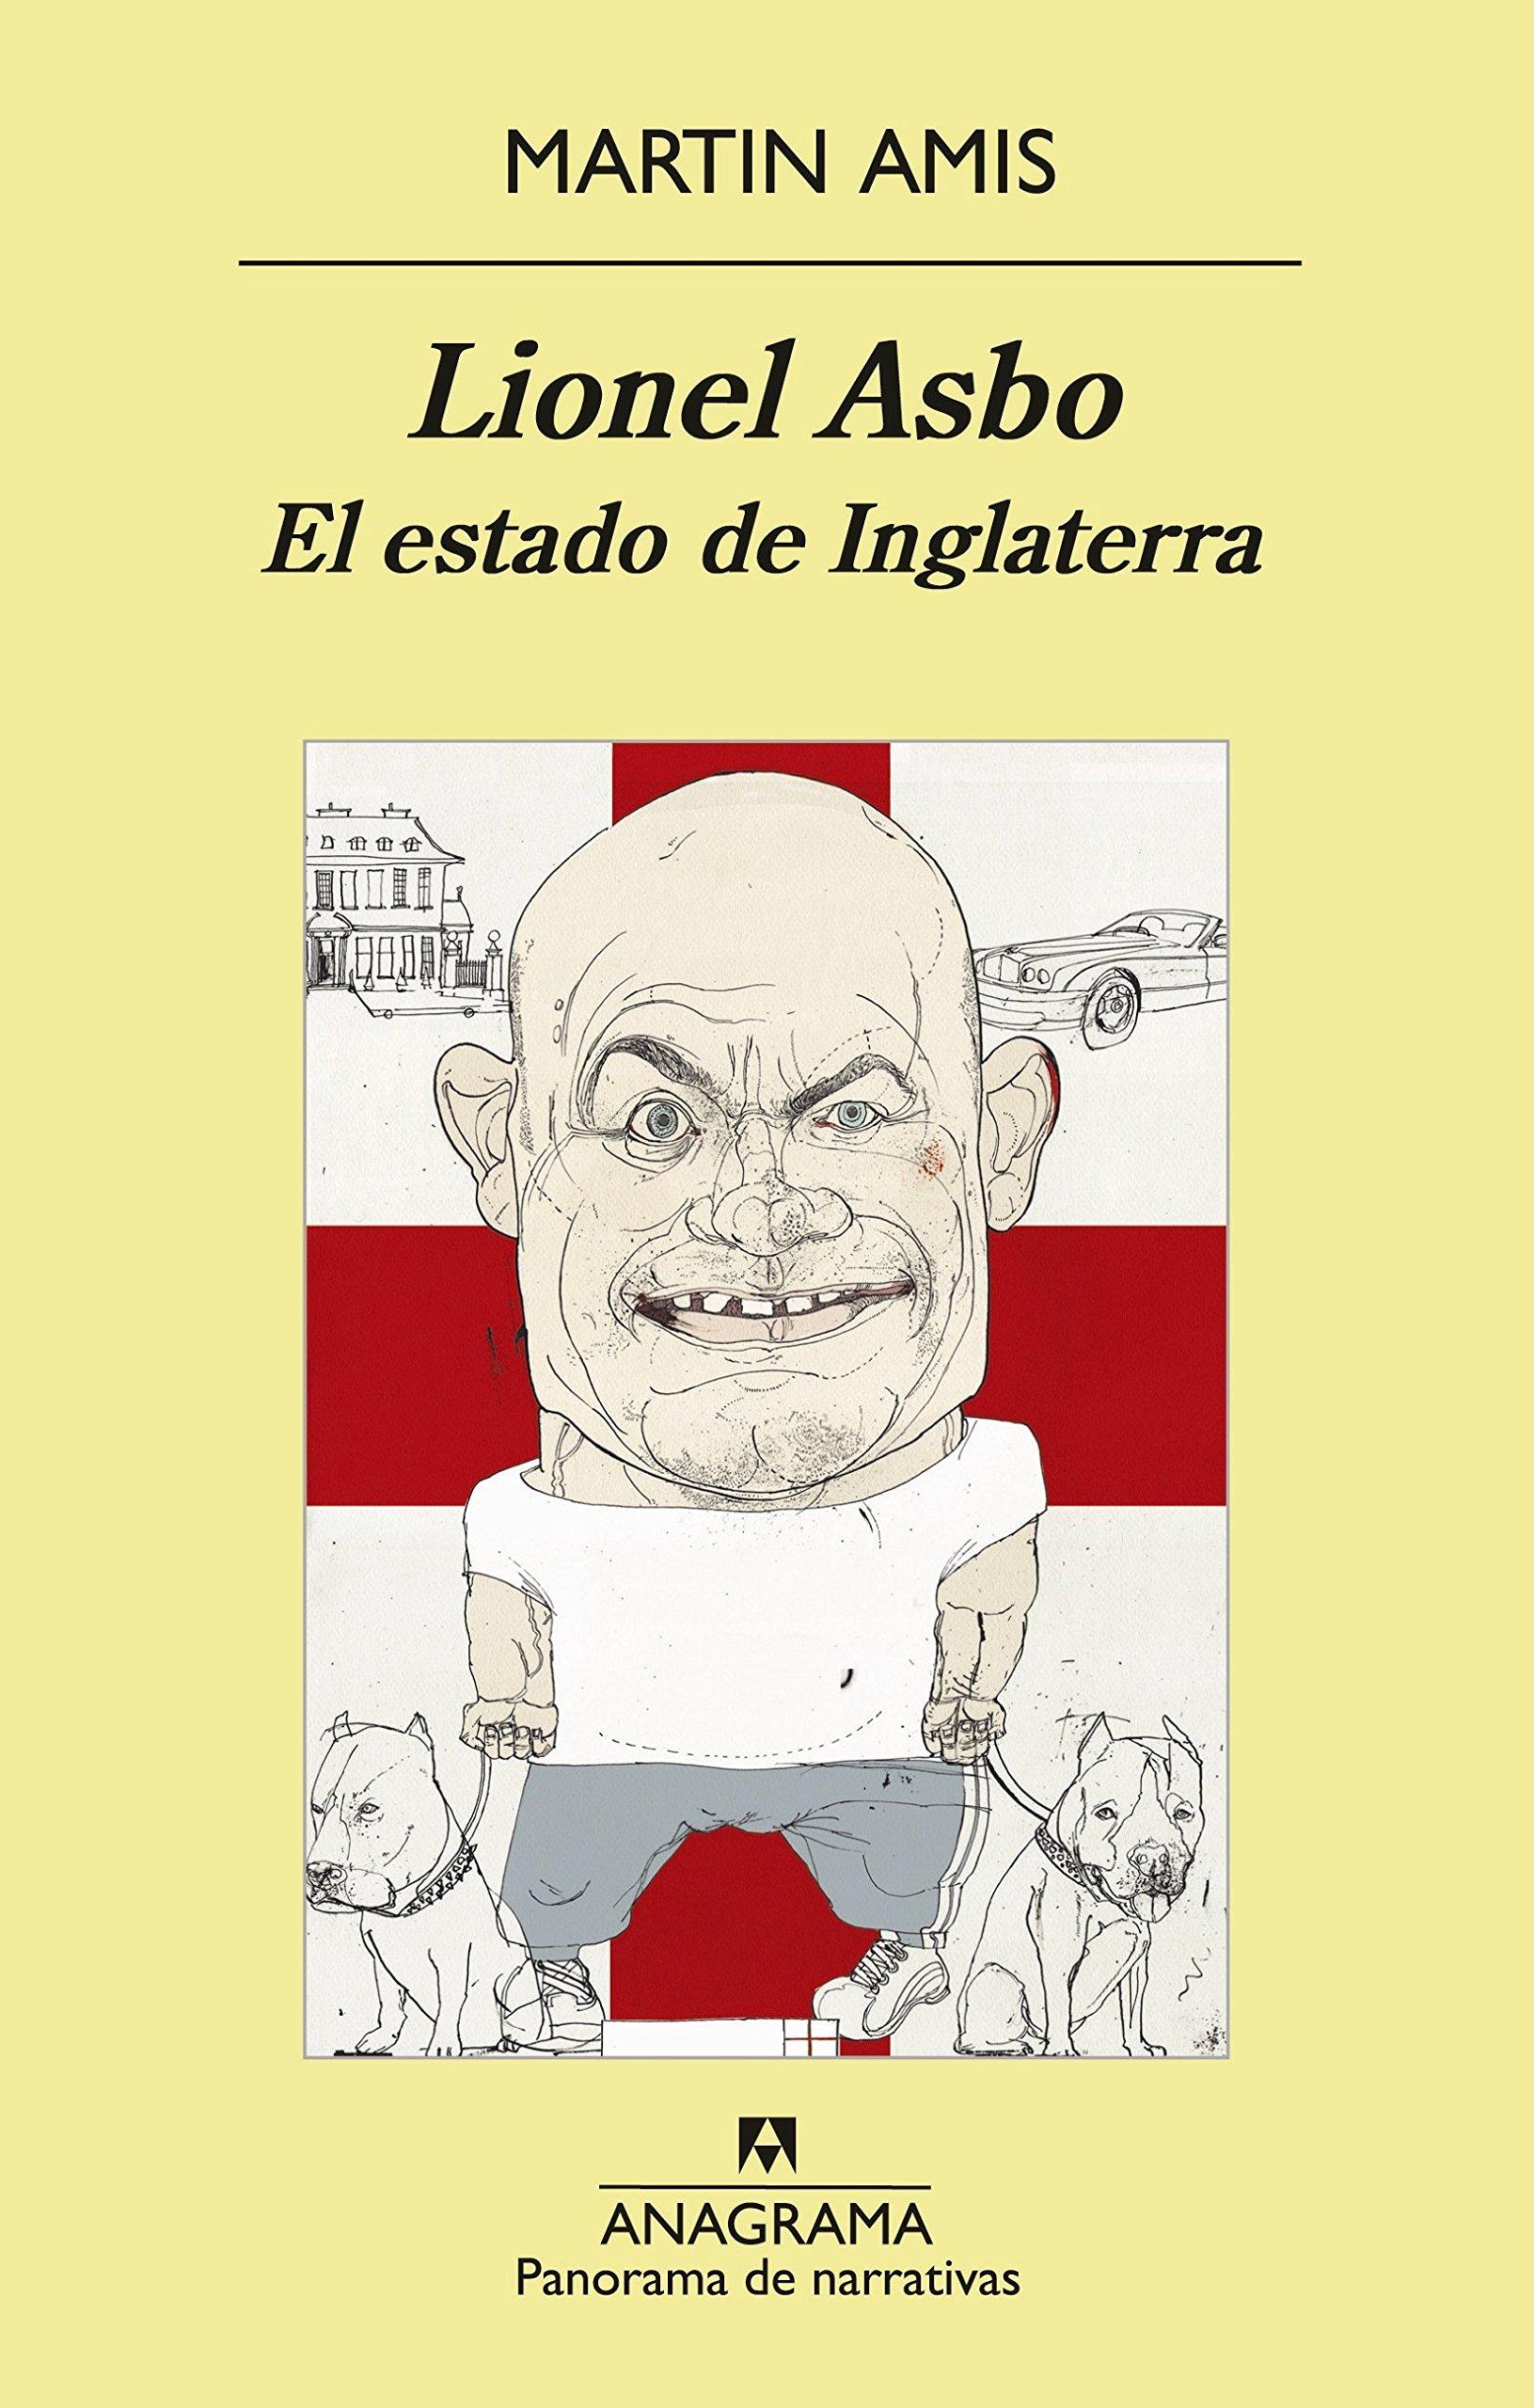 Lionel Asbo. El Estado De Inglaterra (Panorama de narrativas) Tapa blanda – 15 ene 2014 Martin Amis Jesús Zulaika Goicoechea Anagrama 8433978802